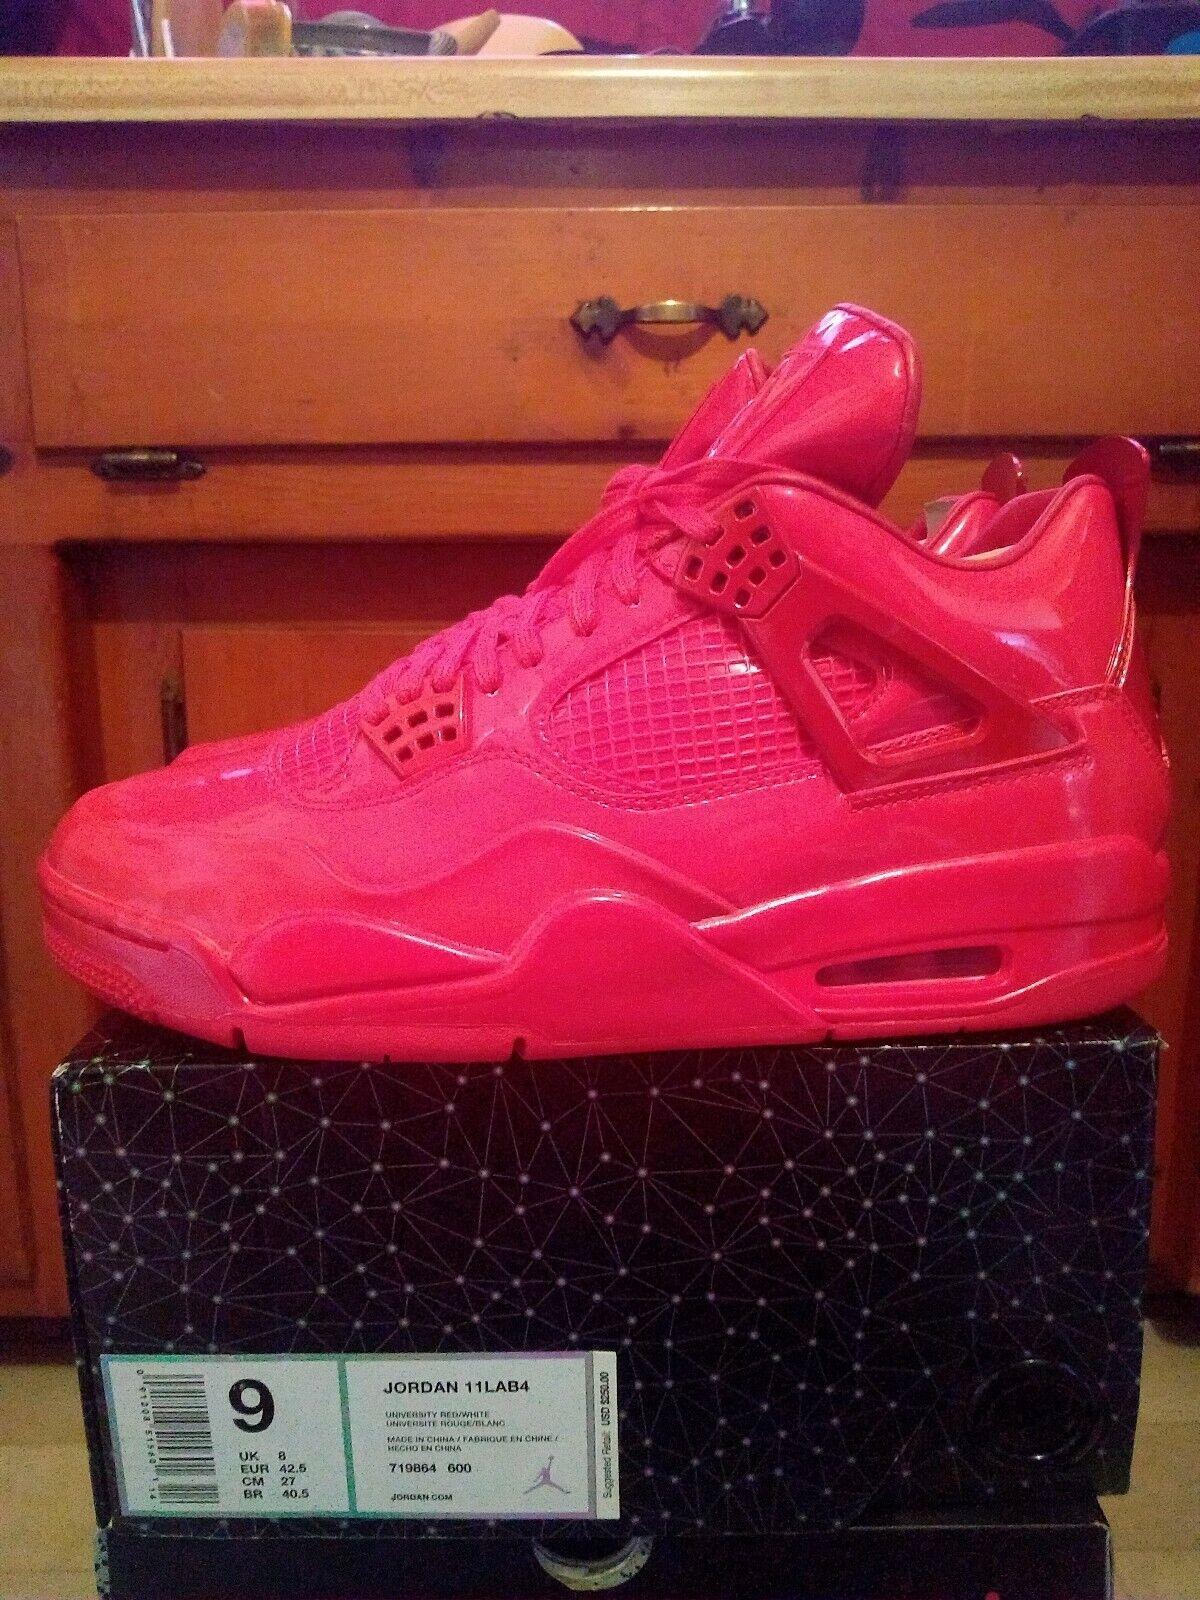 Jordan 11 Lab 4 Red Size 9 DS